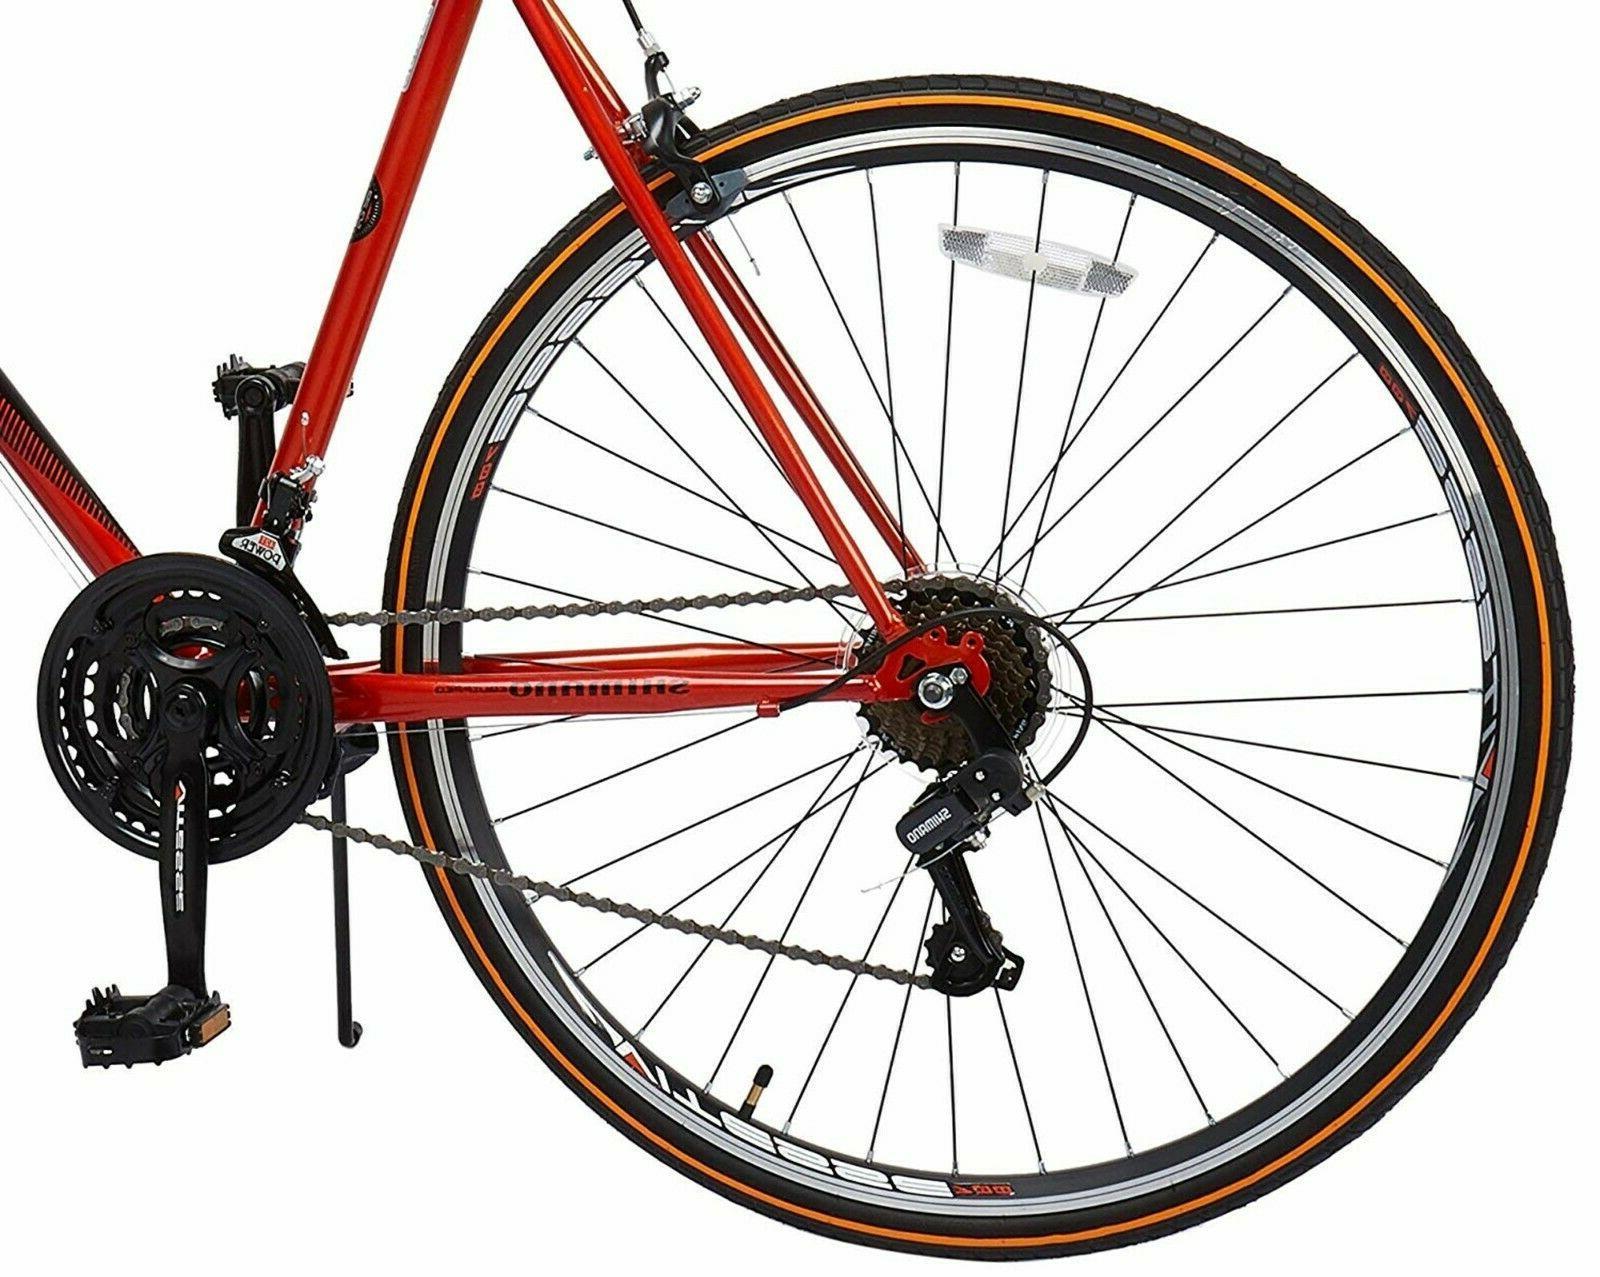 Kent 700c GZR700 Bike